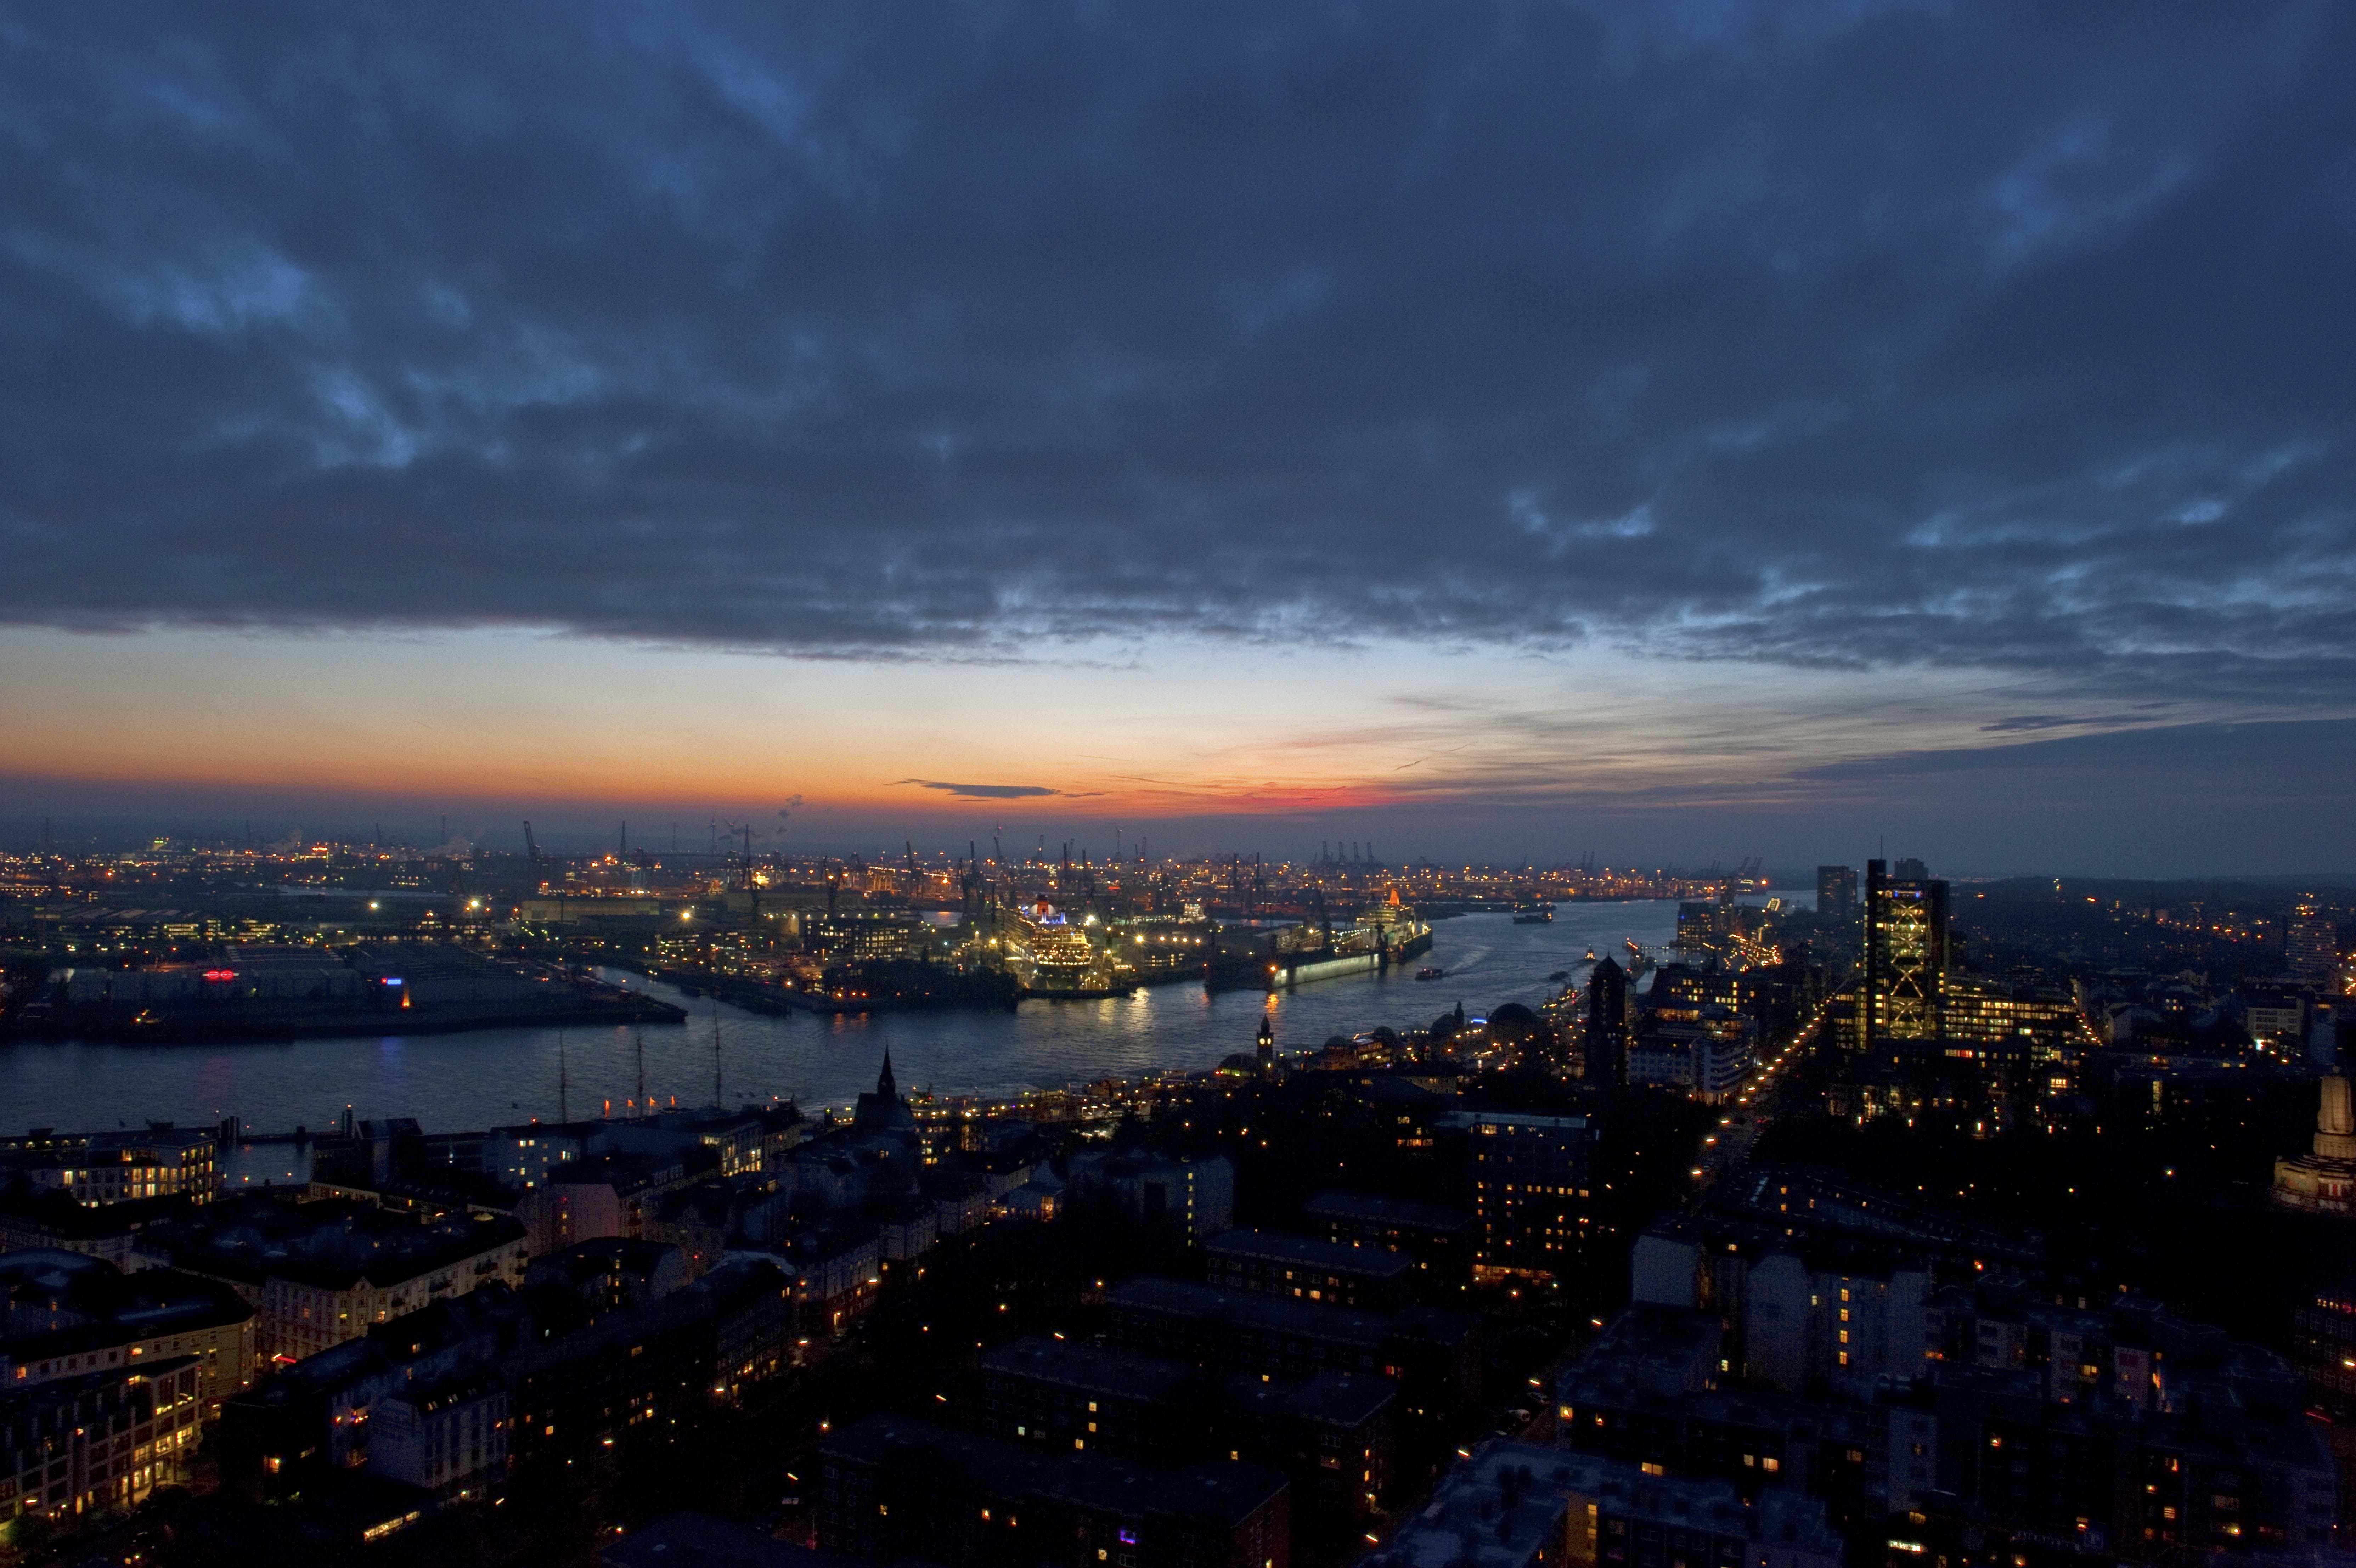 Hamburger Hafen, DE ©Johannes Ratermann